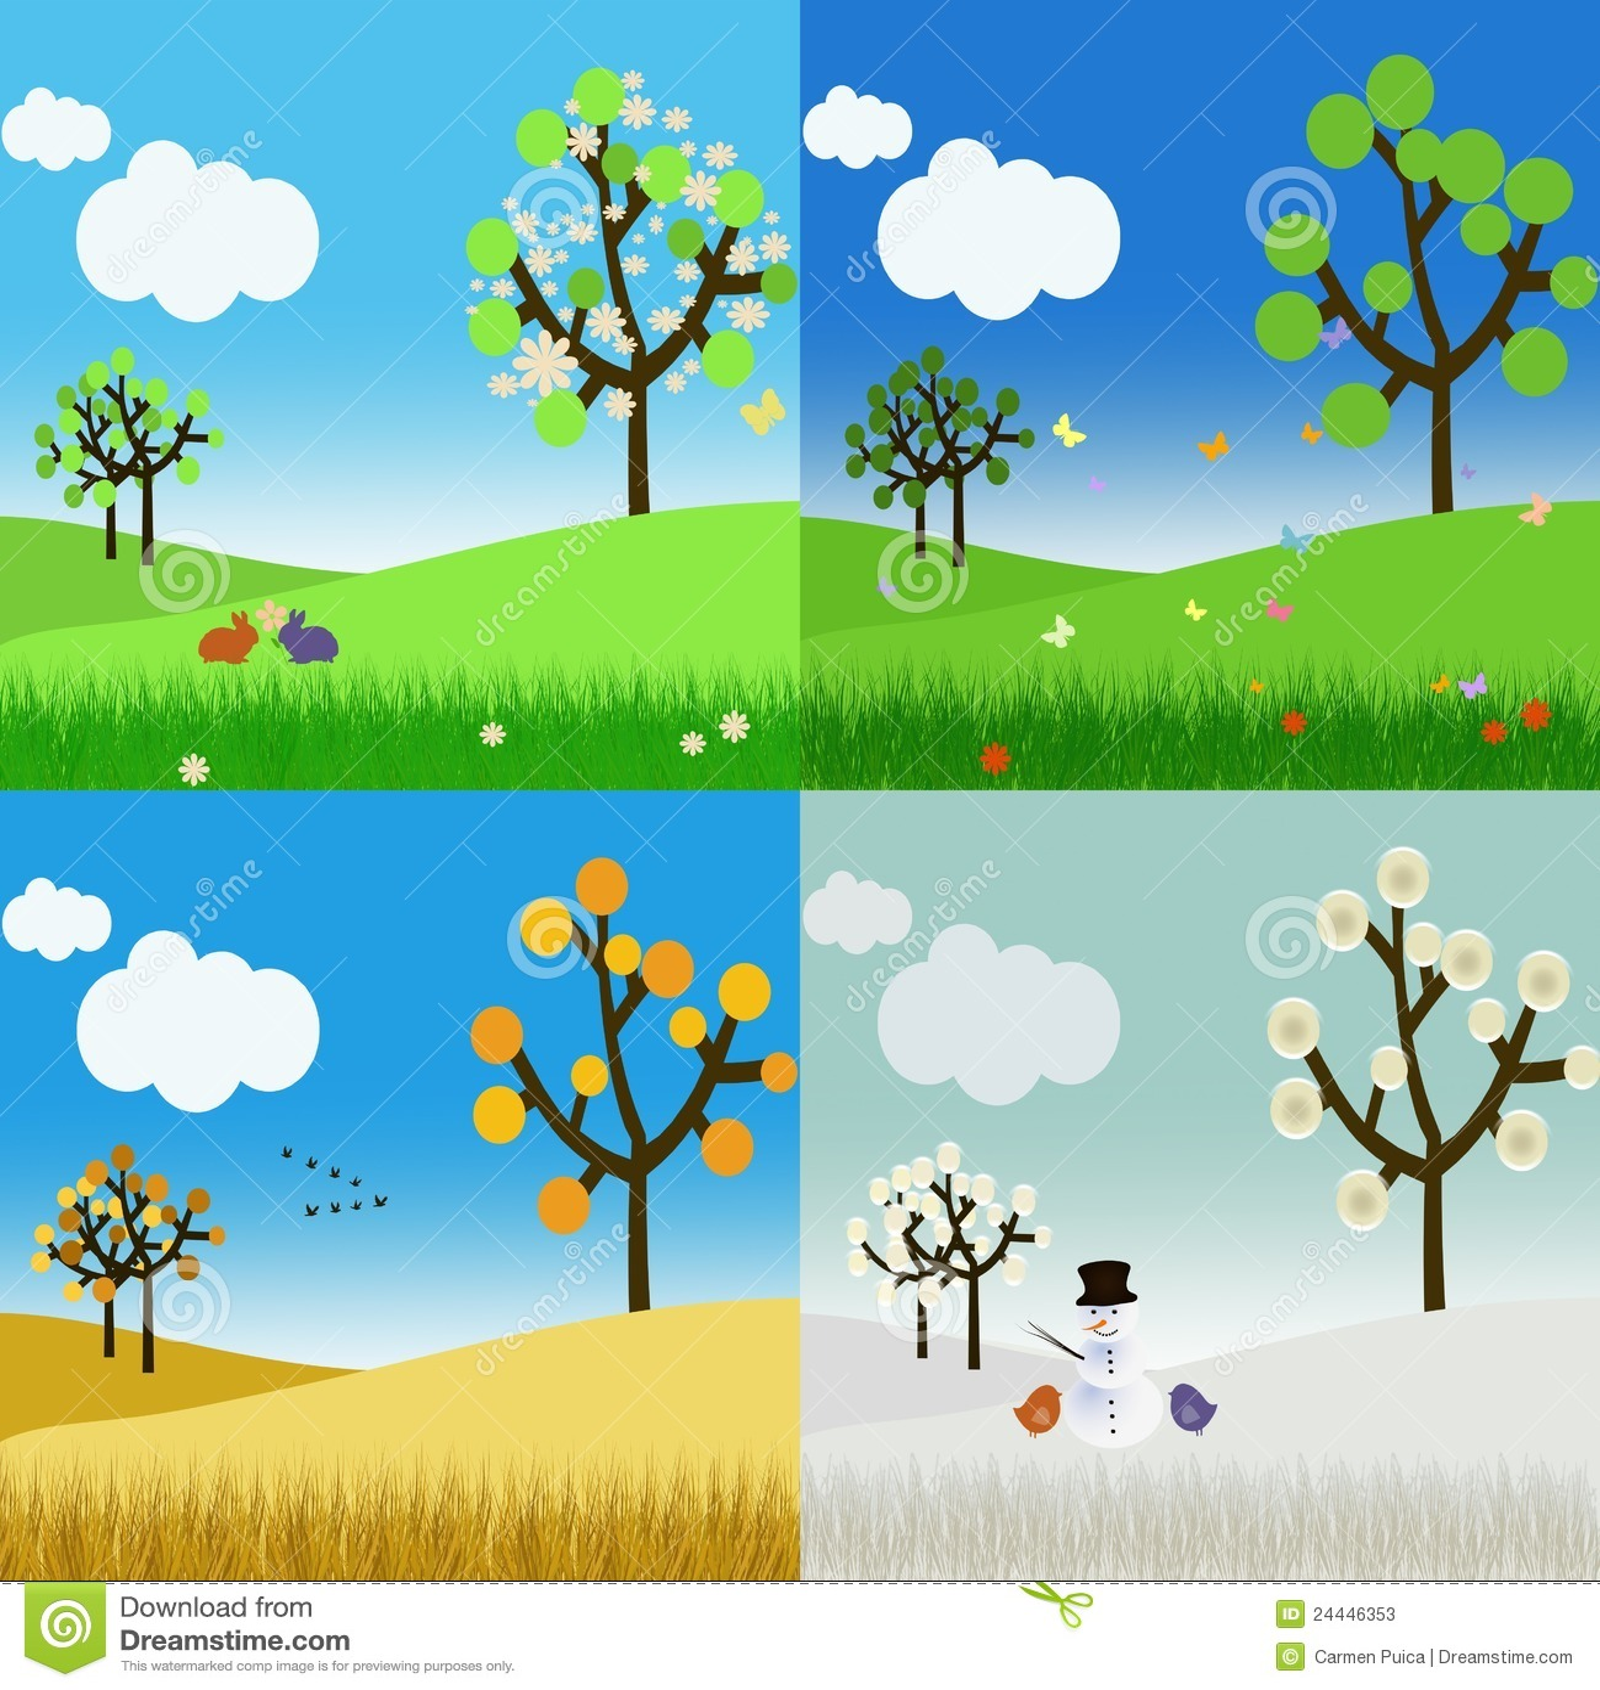 Landscape In The Four Seasons Stock Illustration